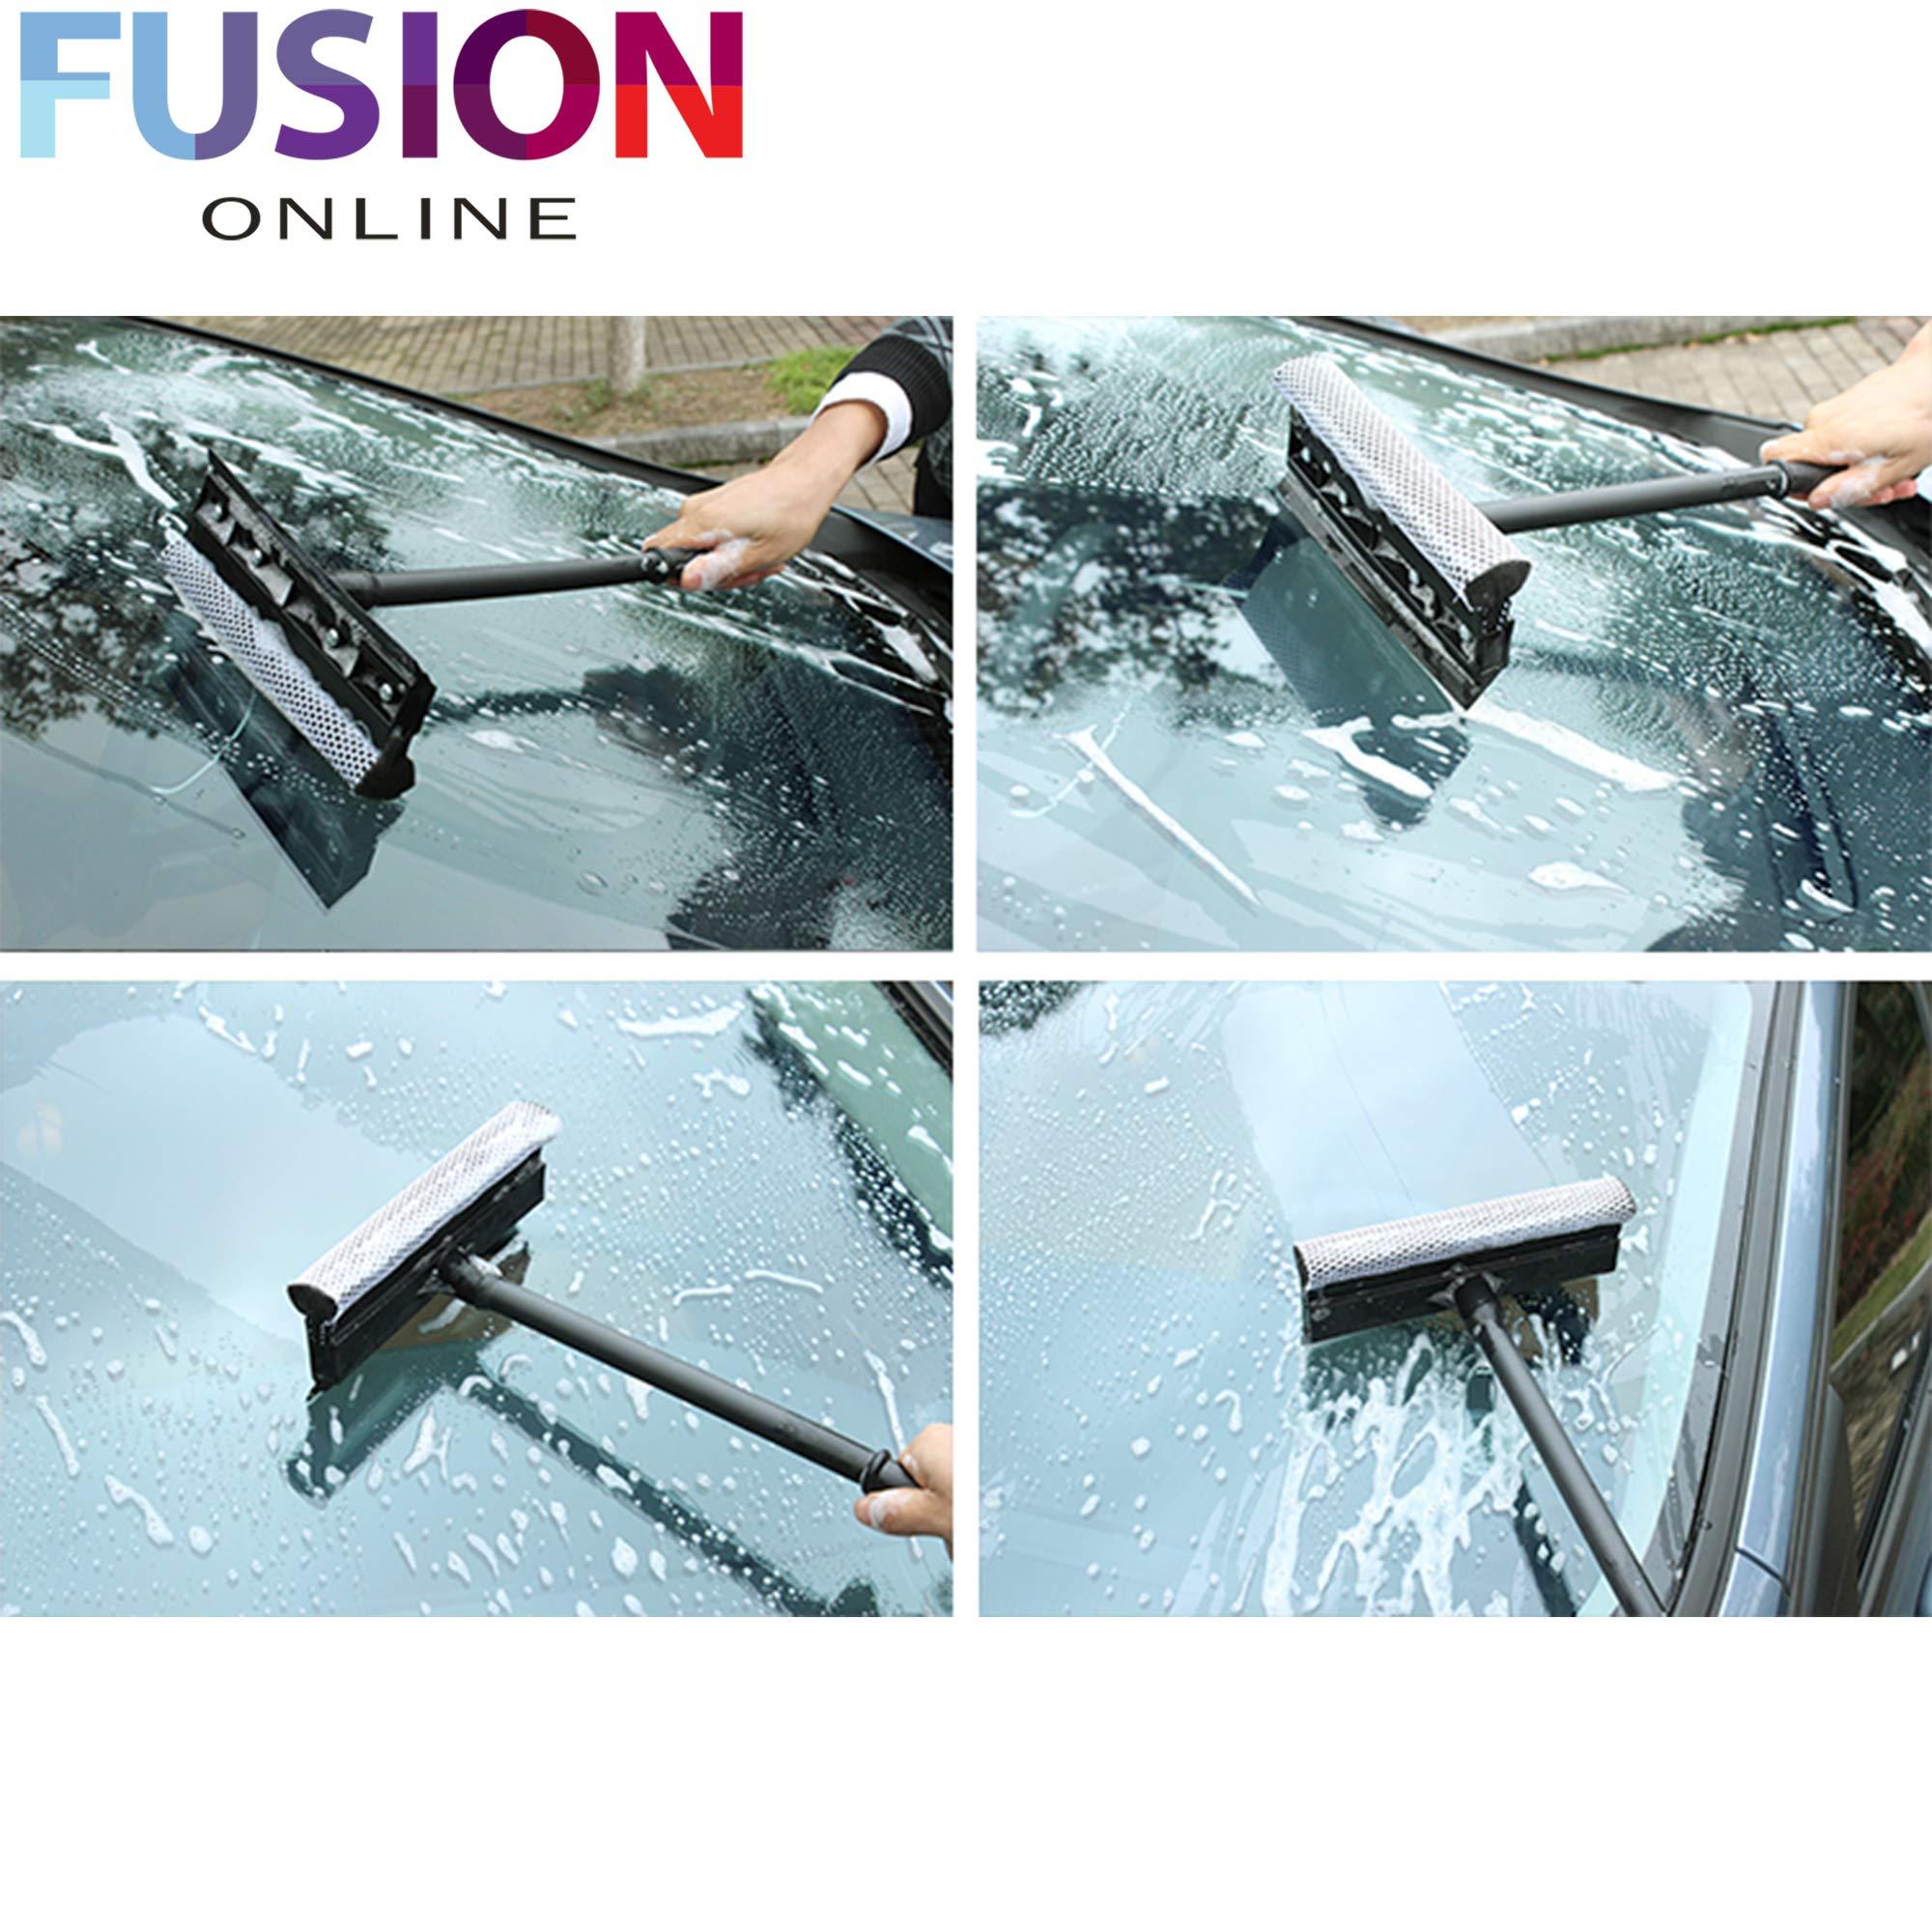 EVELYN LIVING 2 en 1 espátula telescópica para ventana con limpiaparabrisas de esponja, limpiacristales para coche, mampara de ducha, cuarto de baño: Amazon.es: Hogar